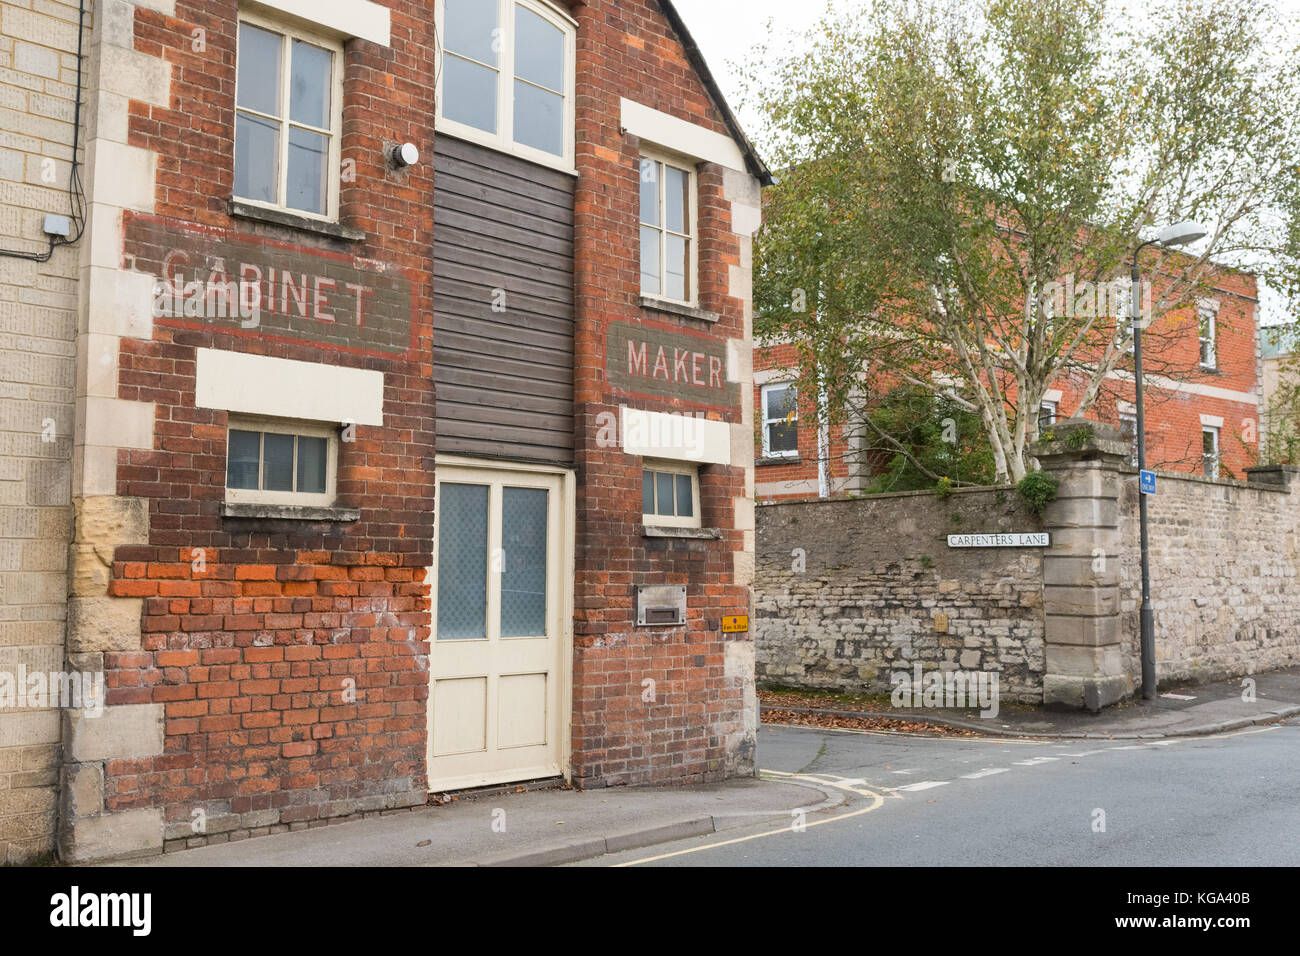 Cabinet Maker on Carpenters Lane, Cirencester, England, UK - street names business - Stock Image